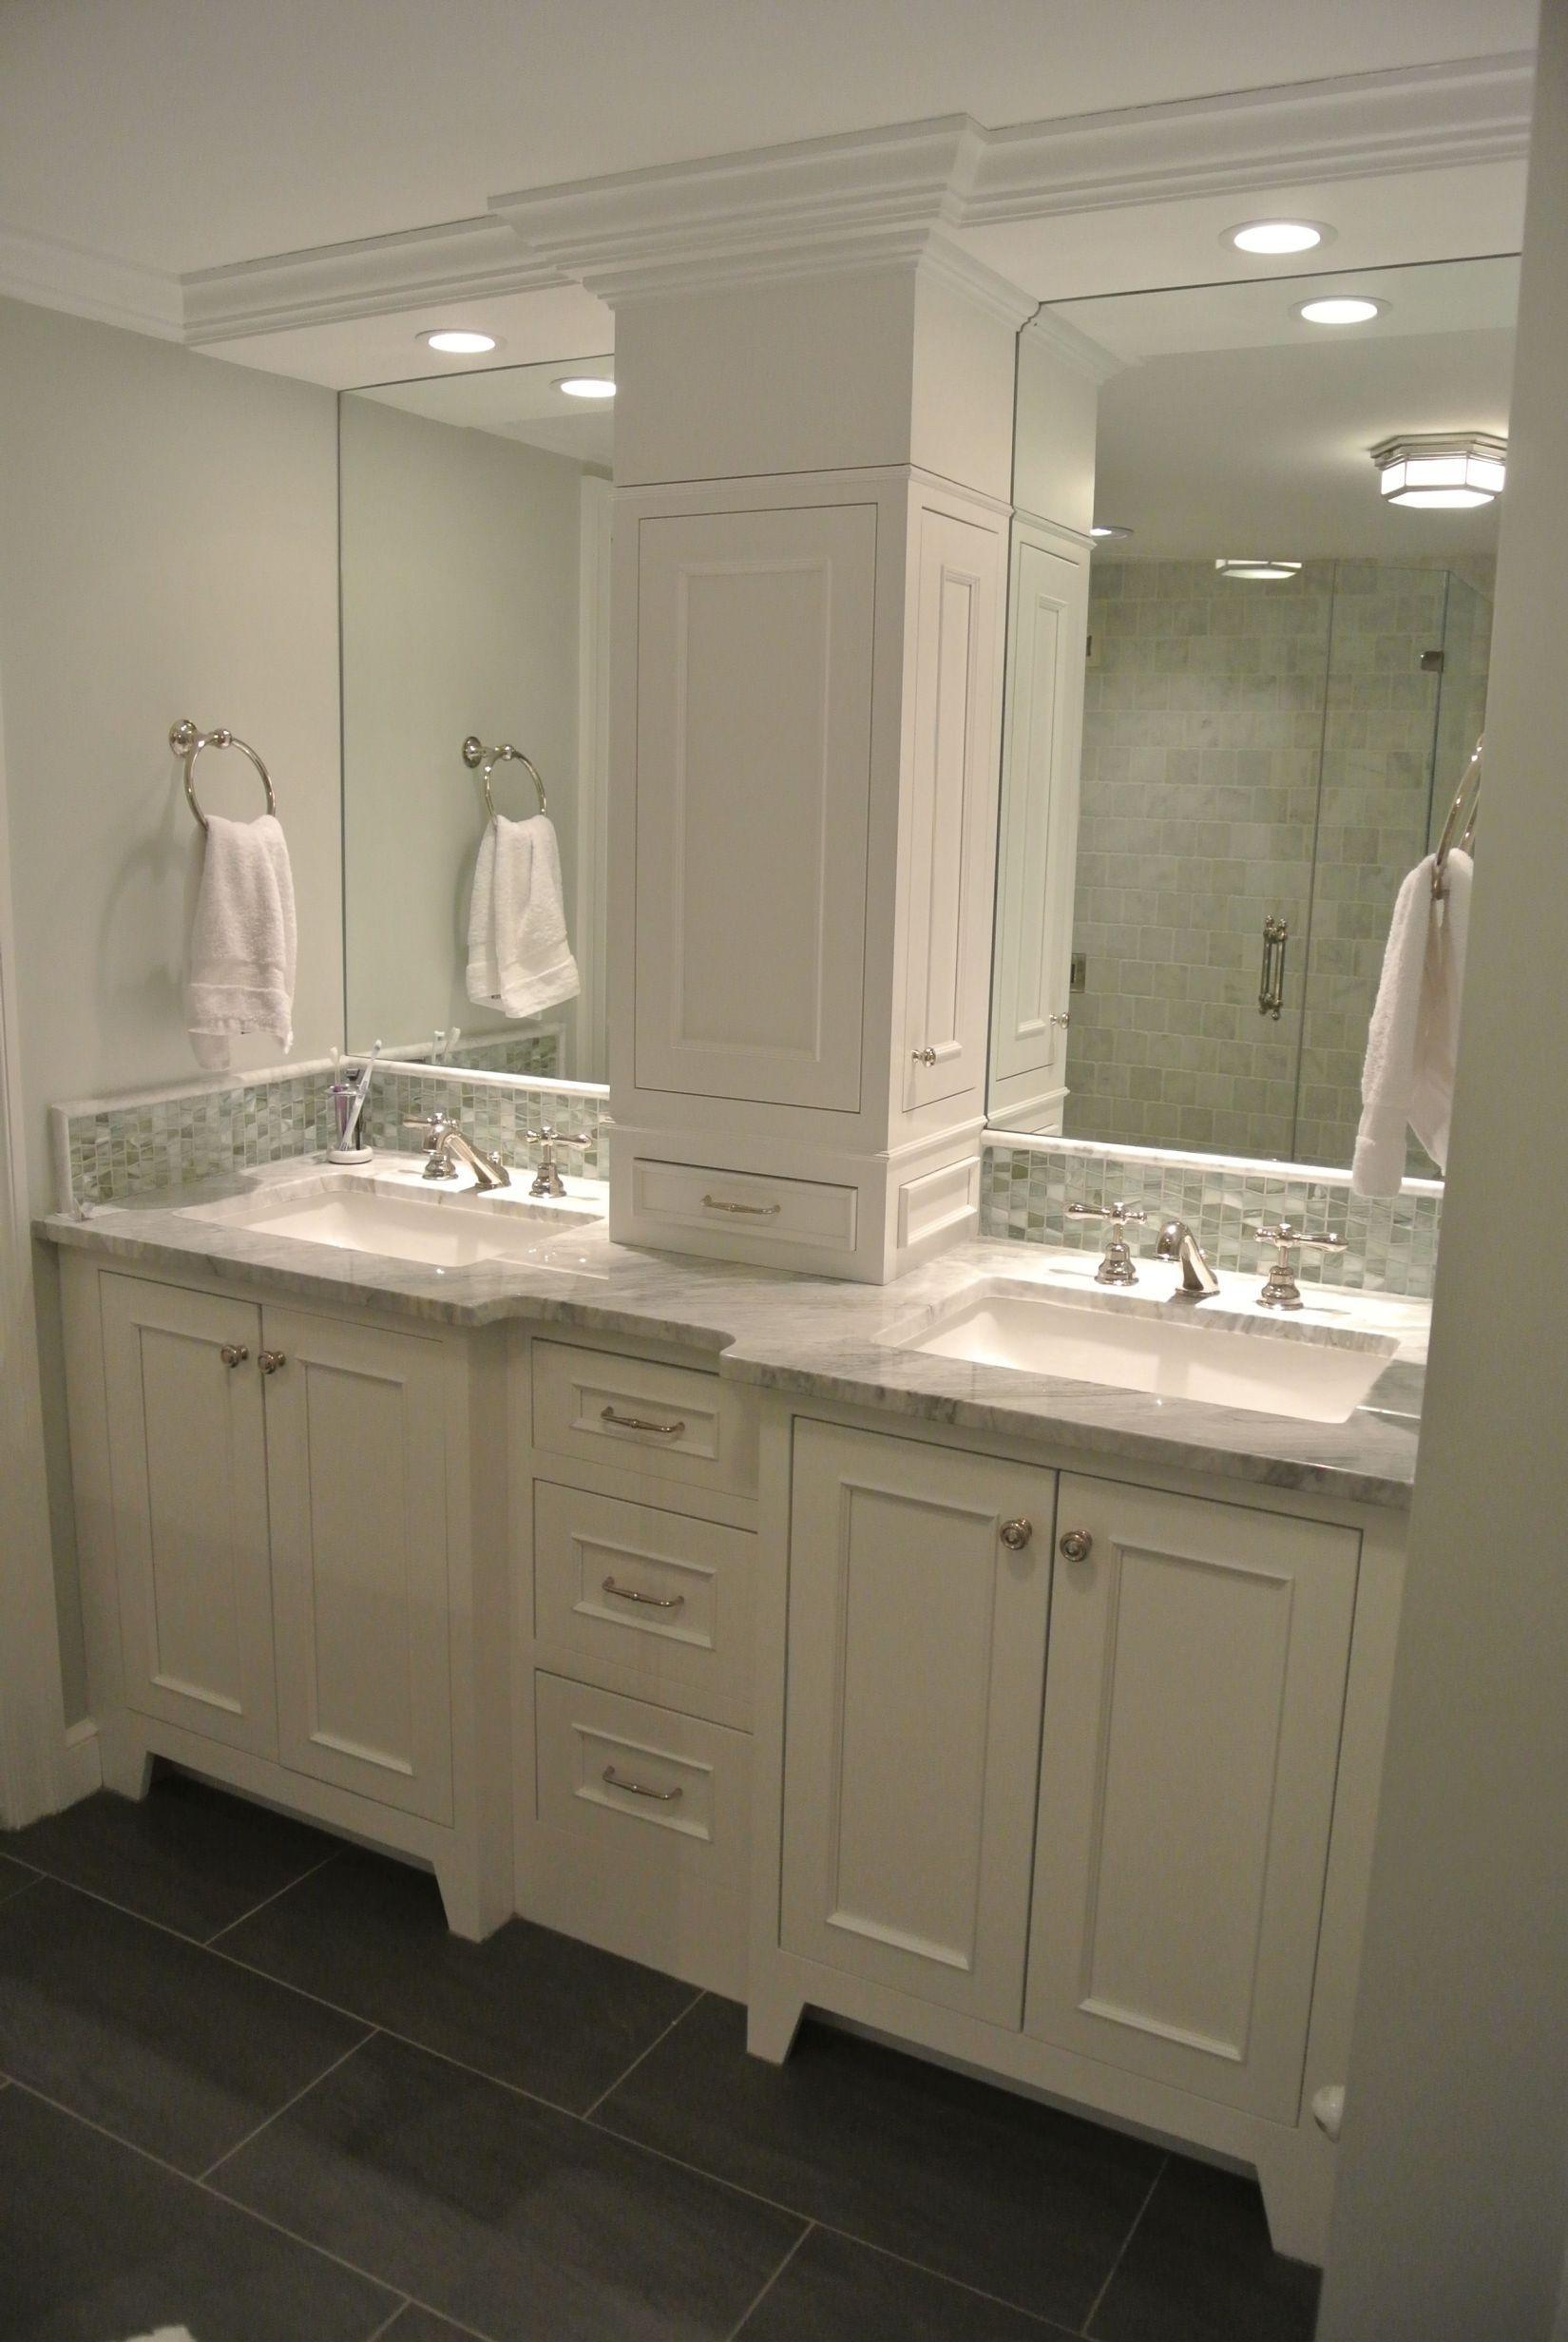 Get The Bathroom You Desired With The Best Vanities And Vanity Tops Enjoy Your Time Bathroom Renovations Bathroom Design Bathroom Counter Storage